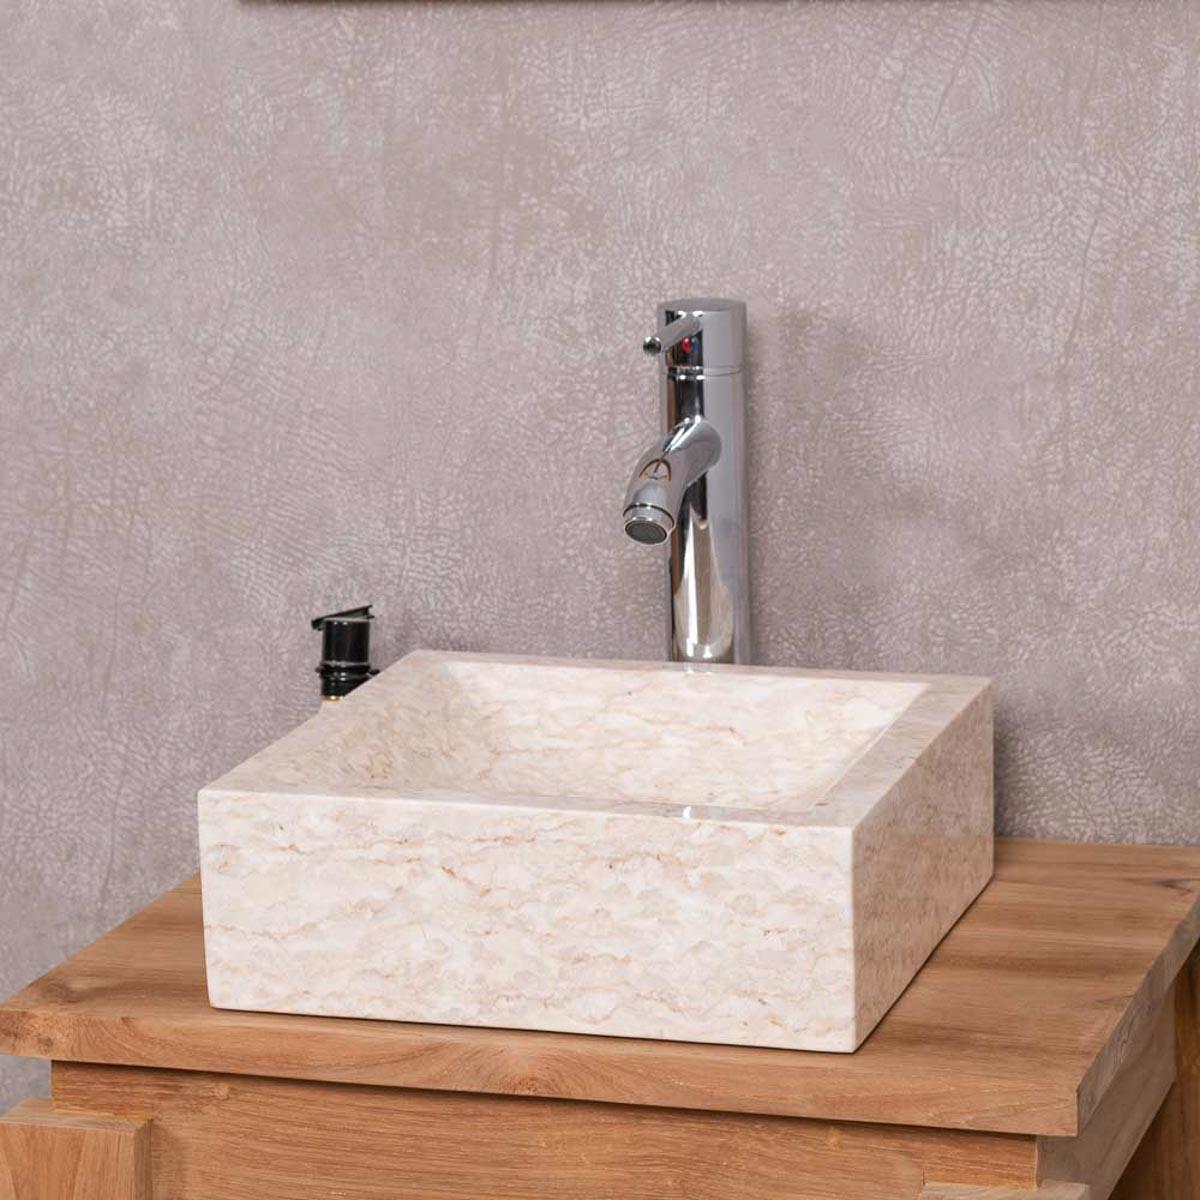 vasque poser marbre carr e cr me alexandrie l 30. Black Bedroom Furniture Sets. Home Design Ideas